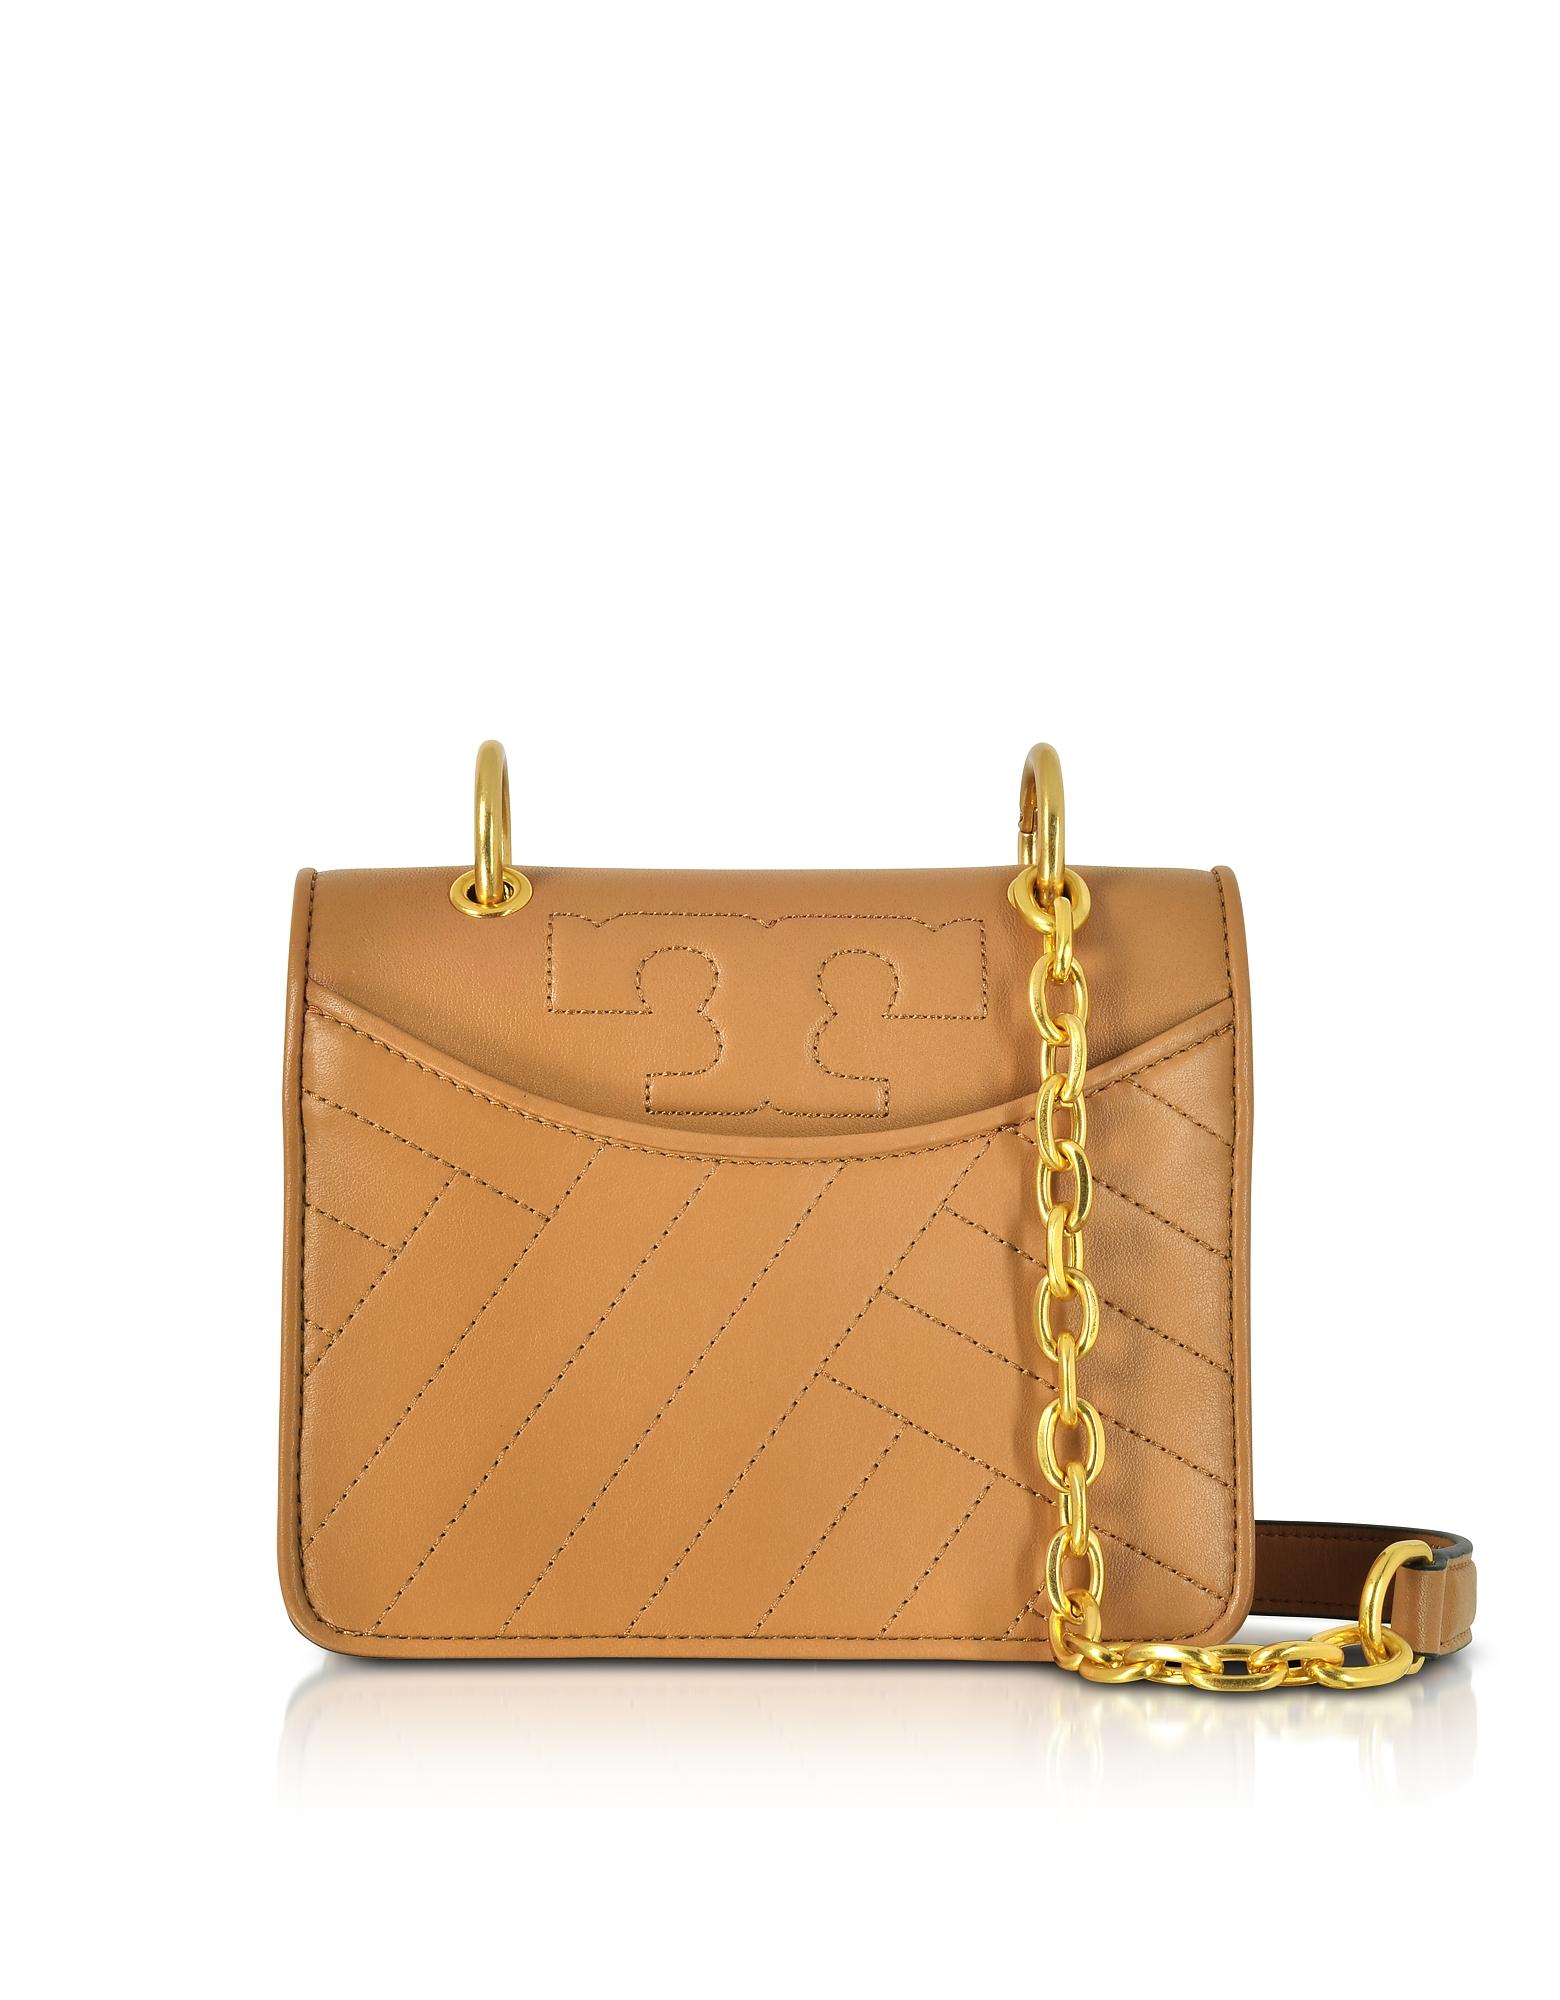 Tory Burch Handbags, Alexa Aged Vachetta Leather Mini Shoulder Bag